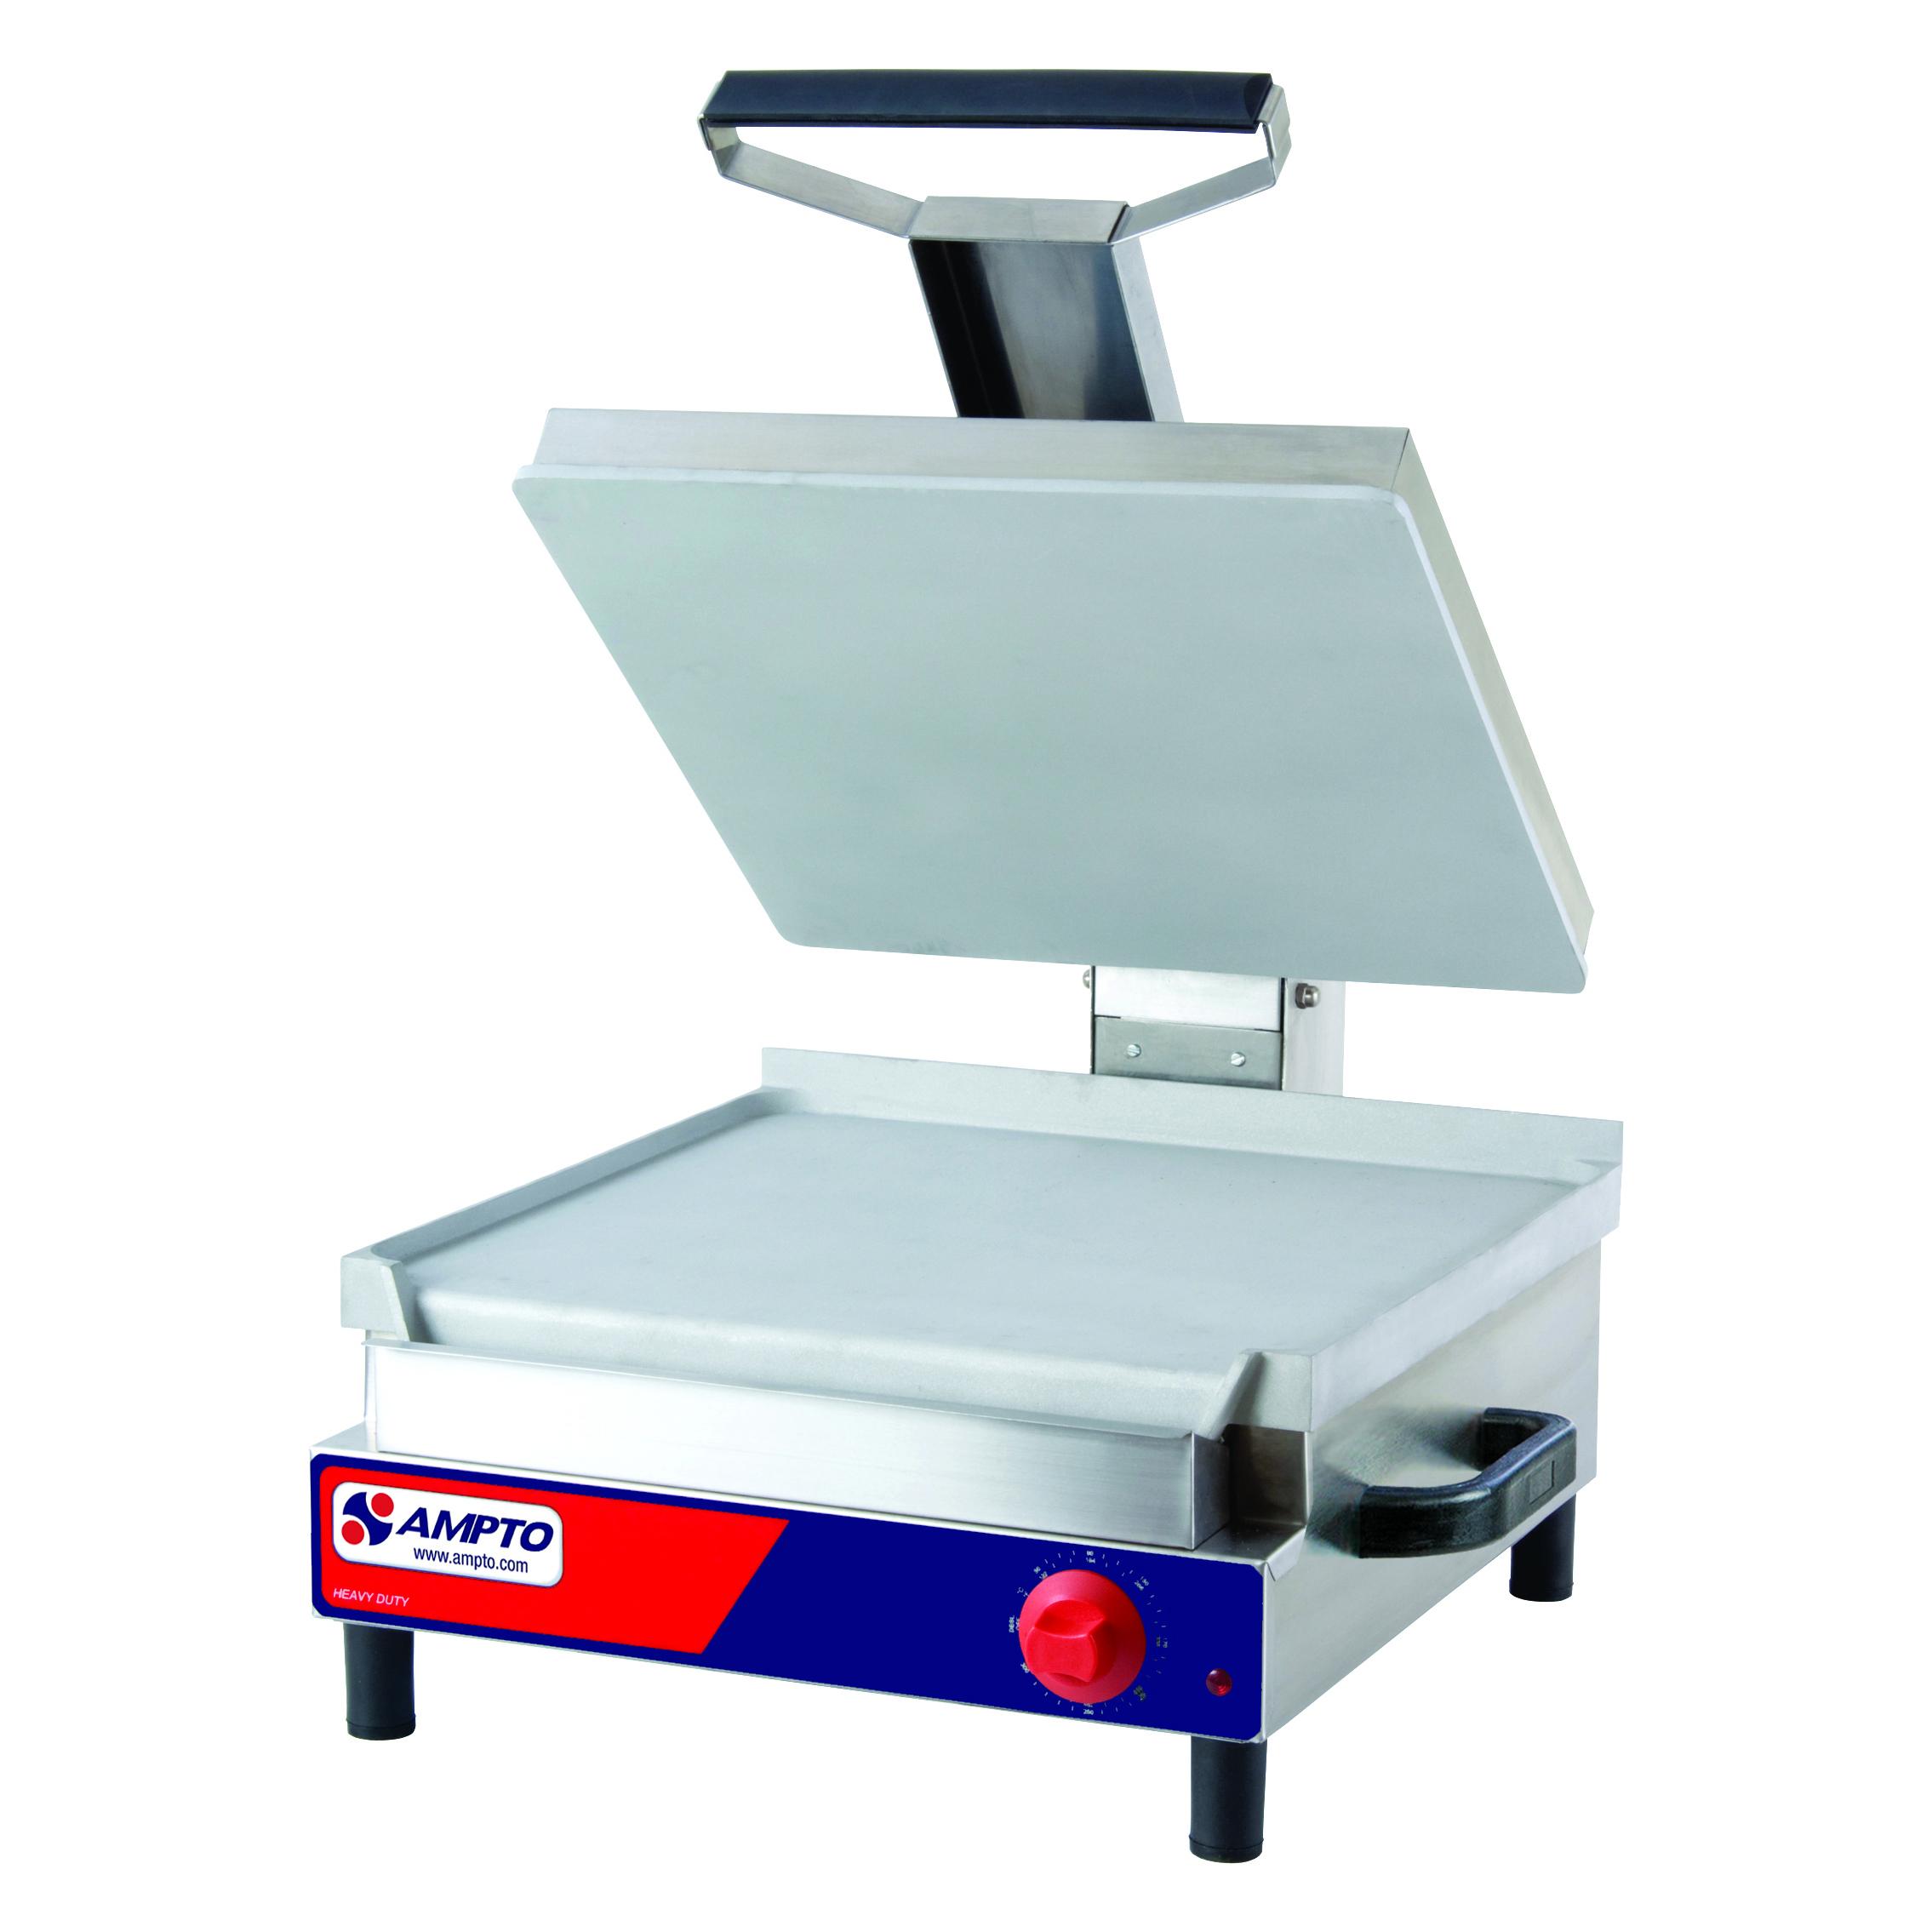 SSGL AMPTO sandwich / panini grill